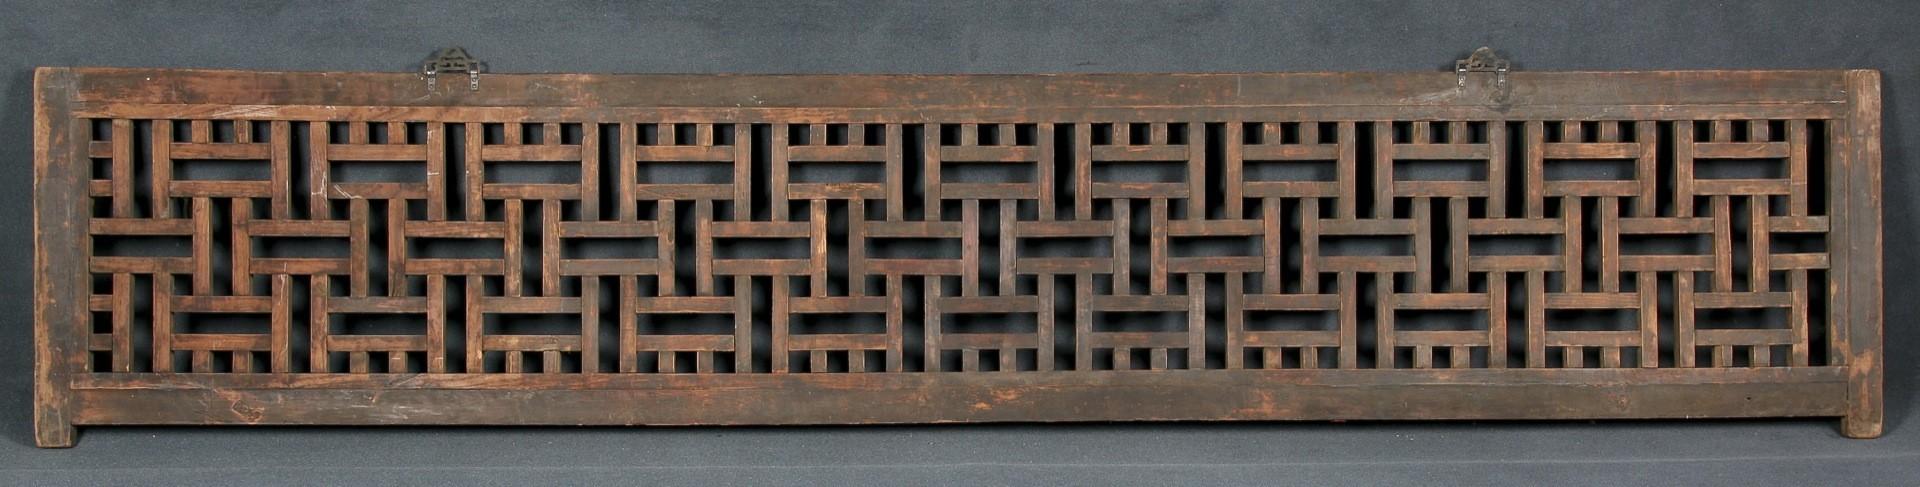 Panel tallado chino